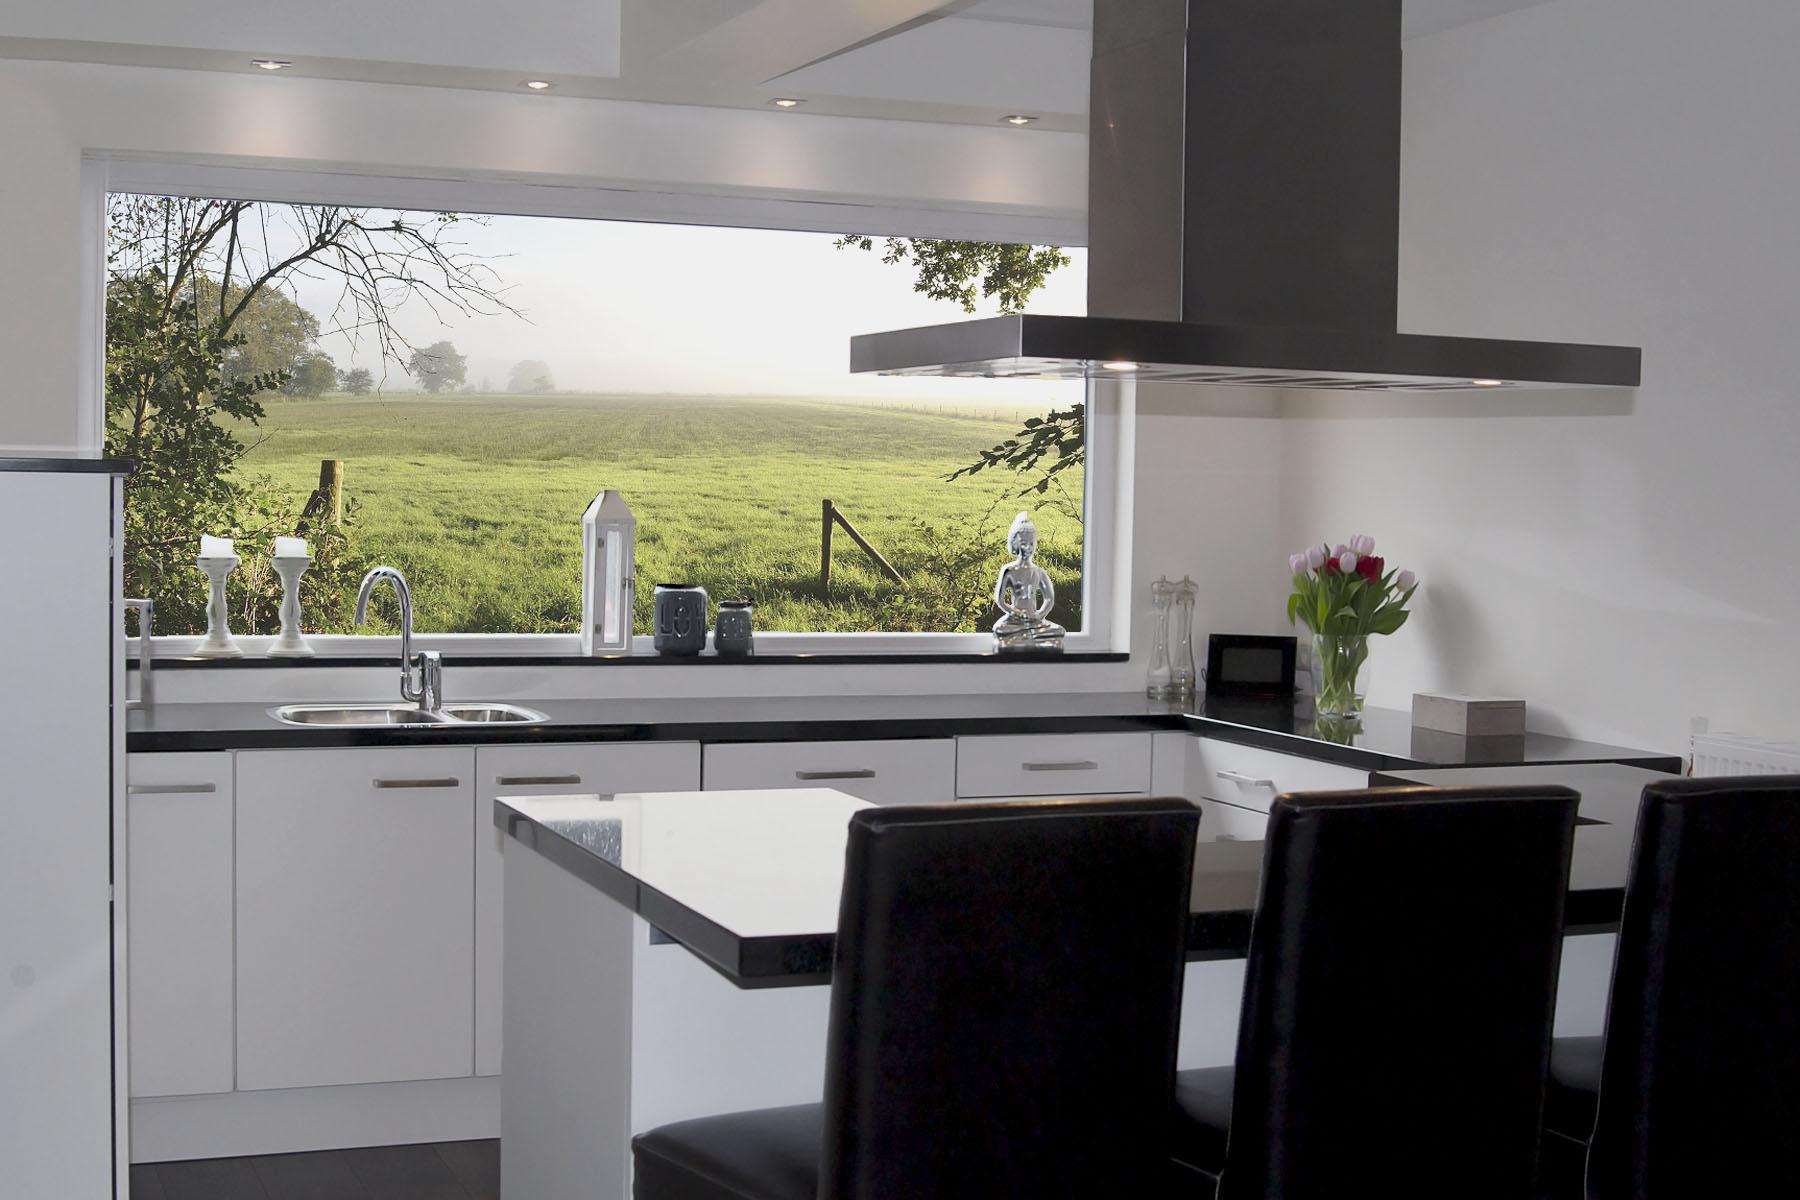 Keuken - Rijnsent Bouw